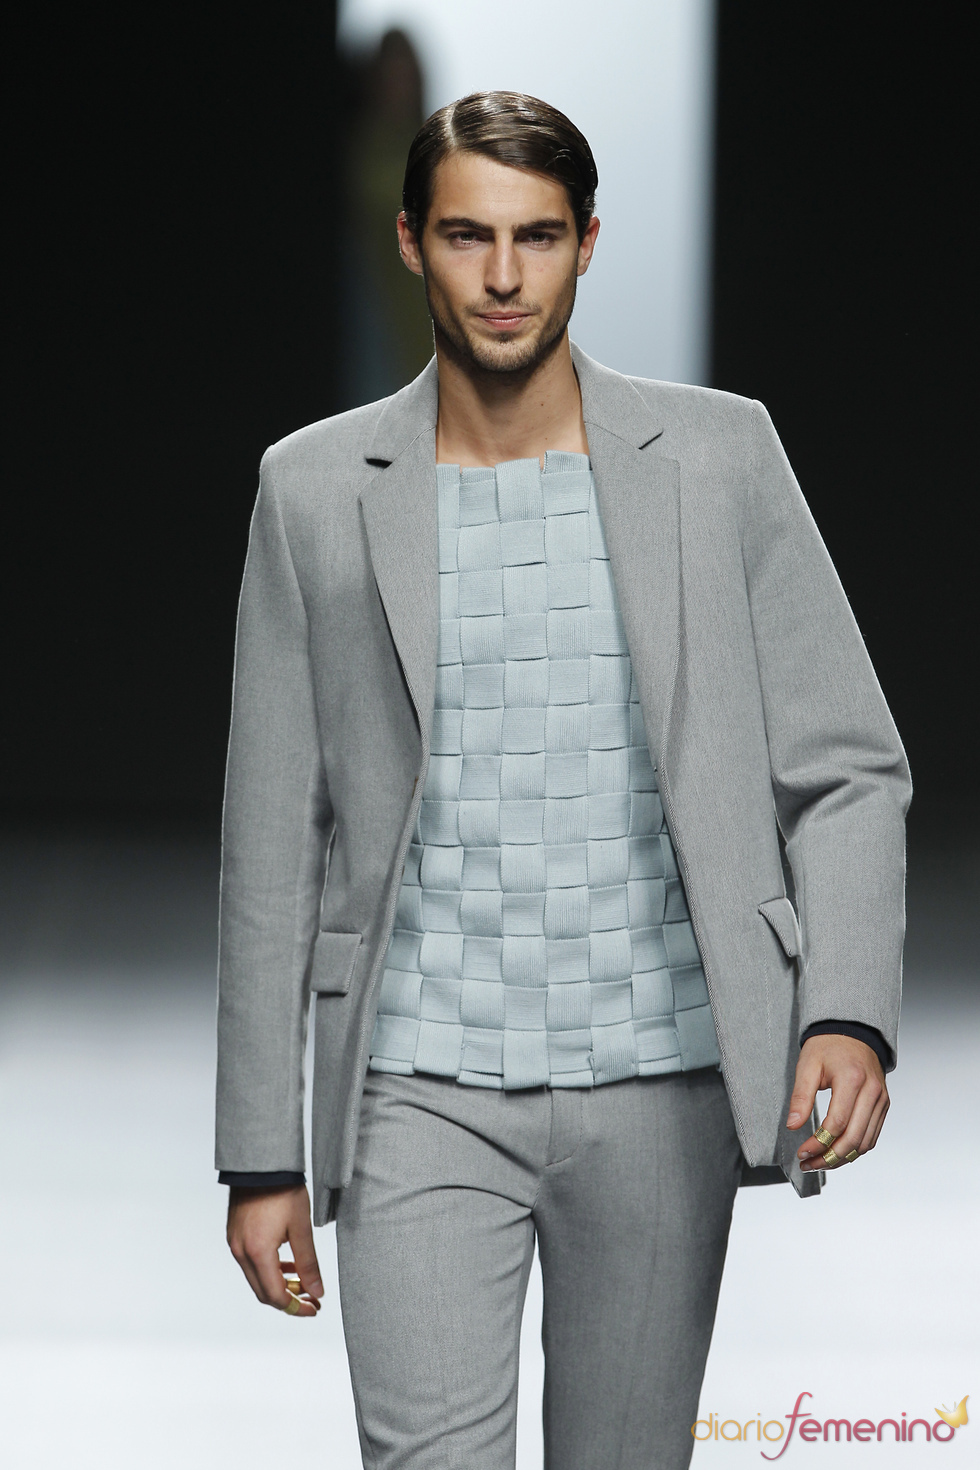 Traje masculino gris. Martín Lamothe. Cibeles Madrid Fashion Week 2011